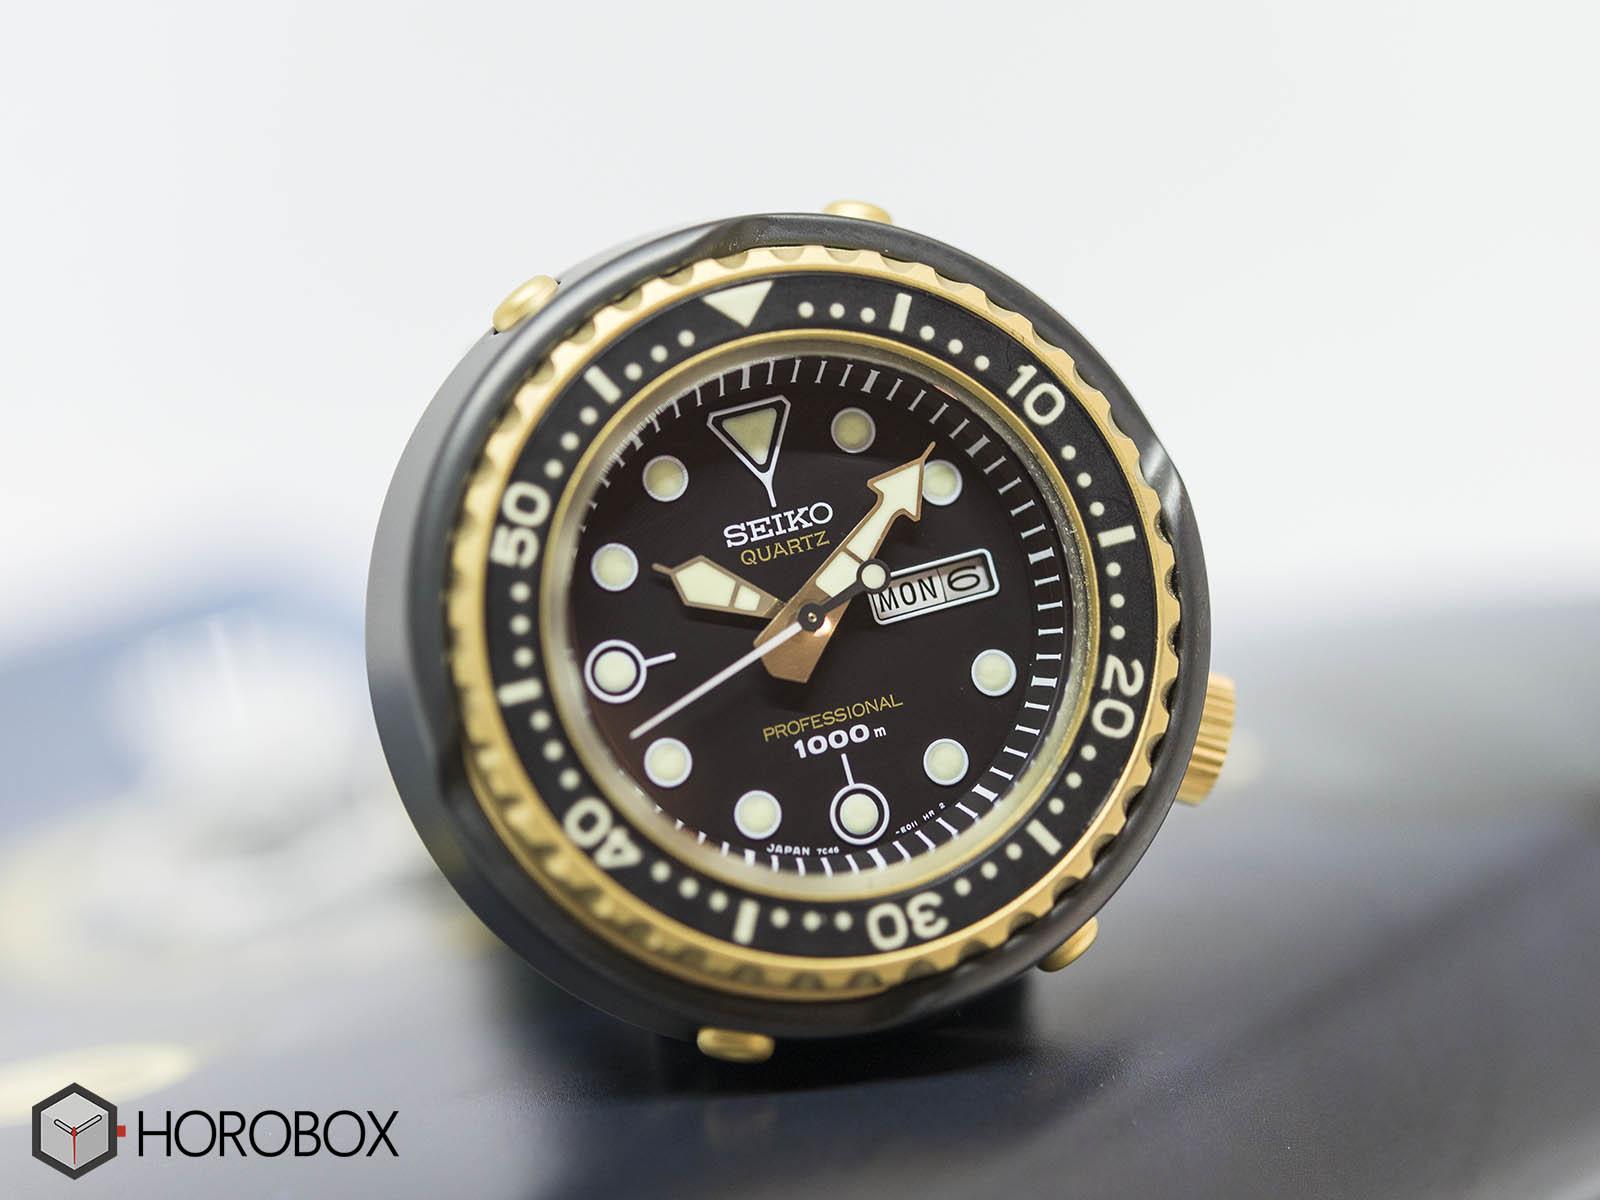 s23626-seiko-prospex-1000m-limited-edition-3.jpg